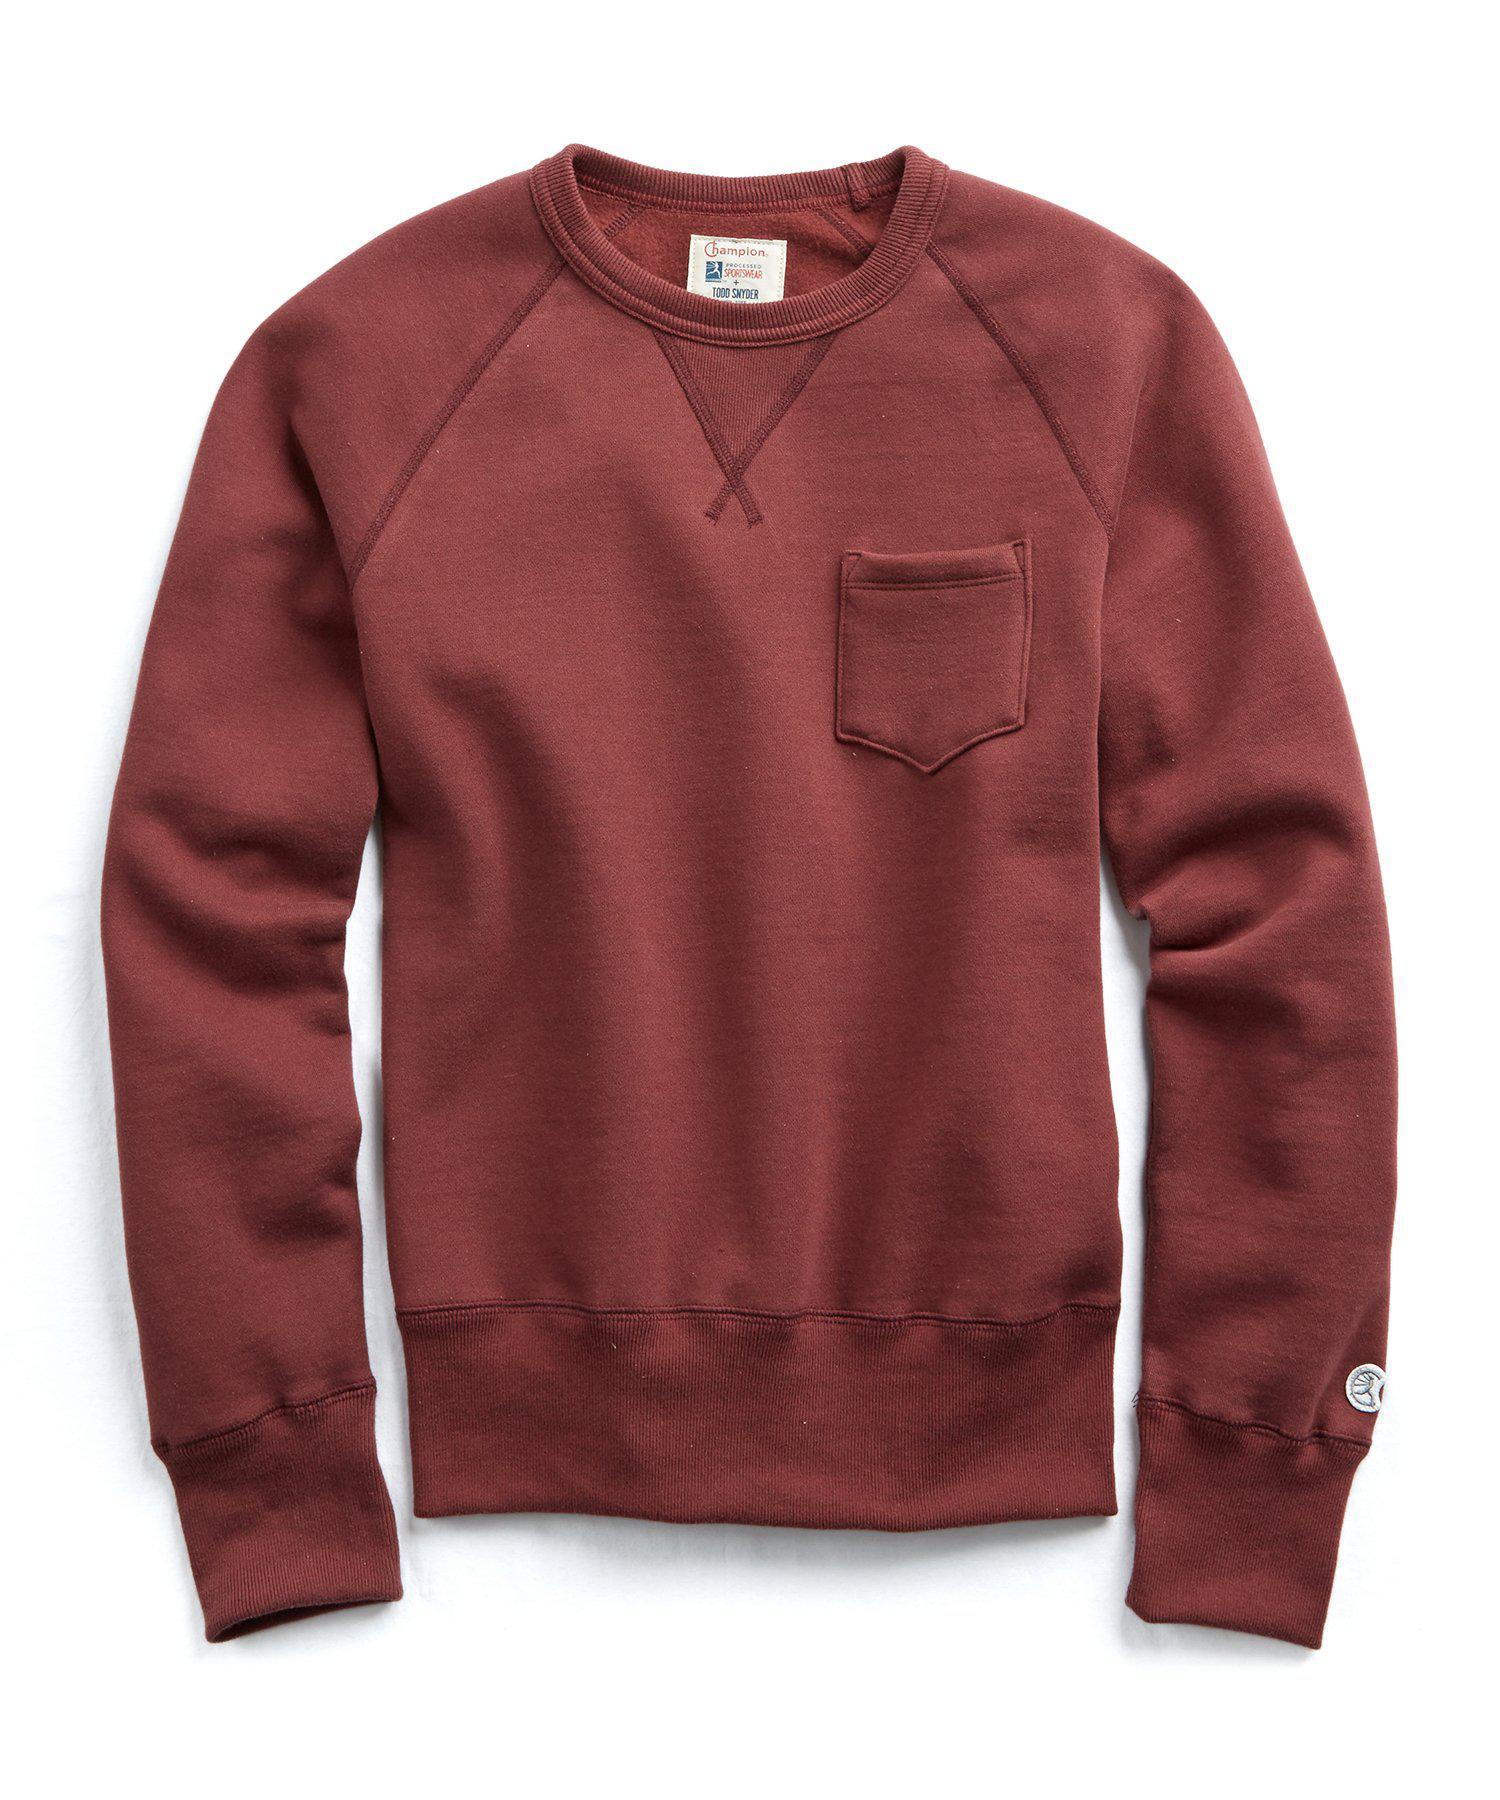 2eb4efdc32bc Todd Snyder Classic Pocket Sweatshirt In Crimson in Red for Men - Lyst